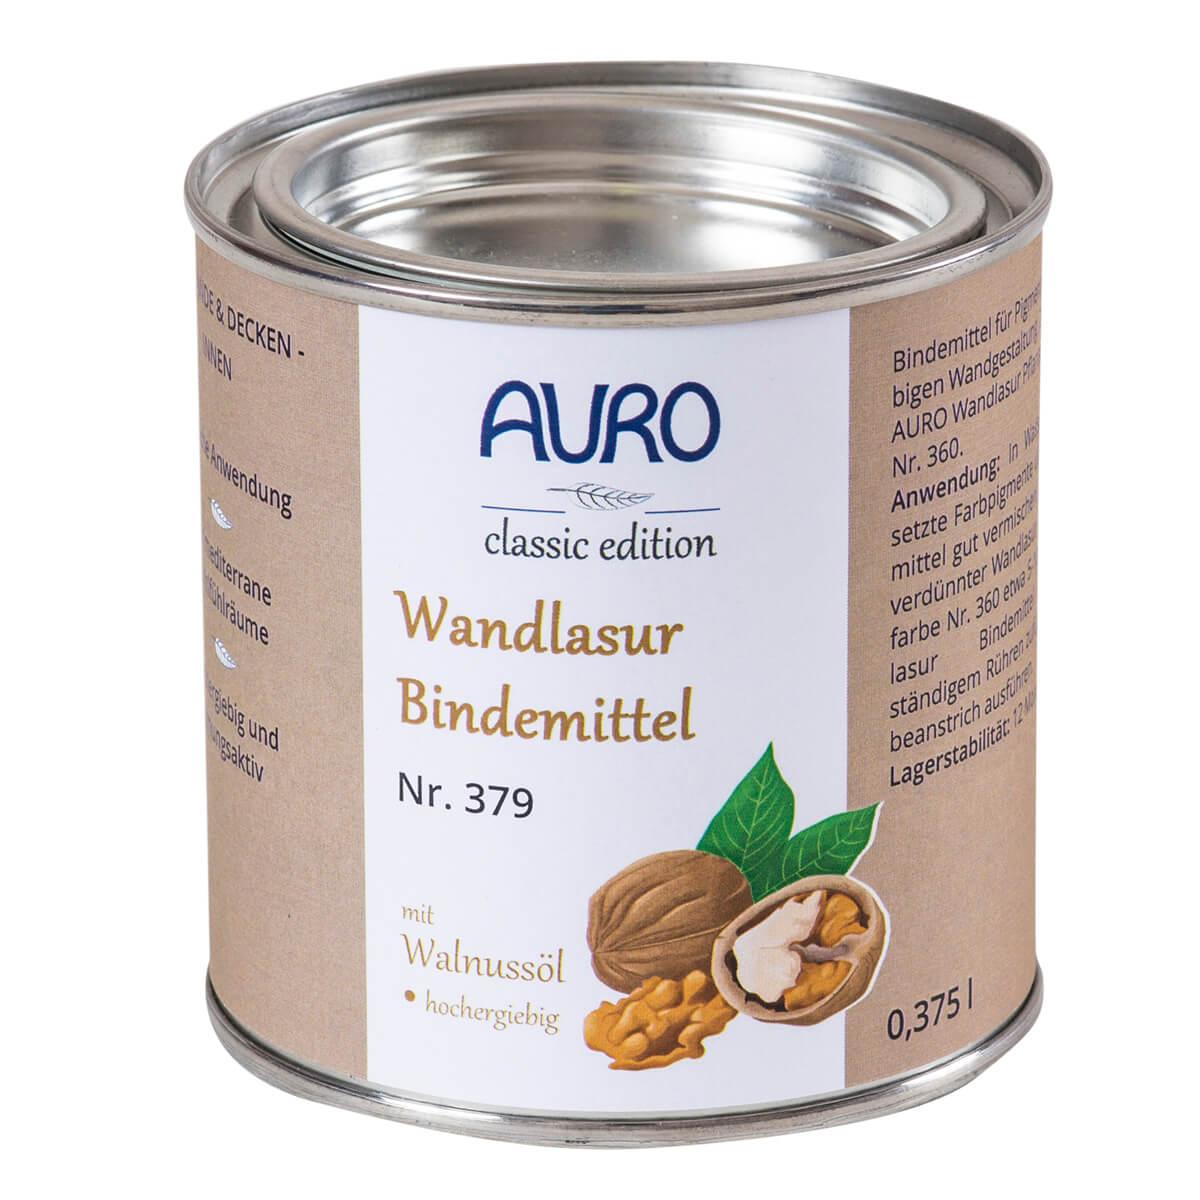 AURO Wandlasur-Bindemittel